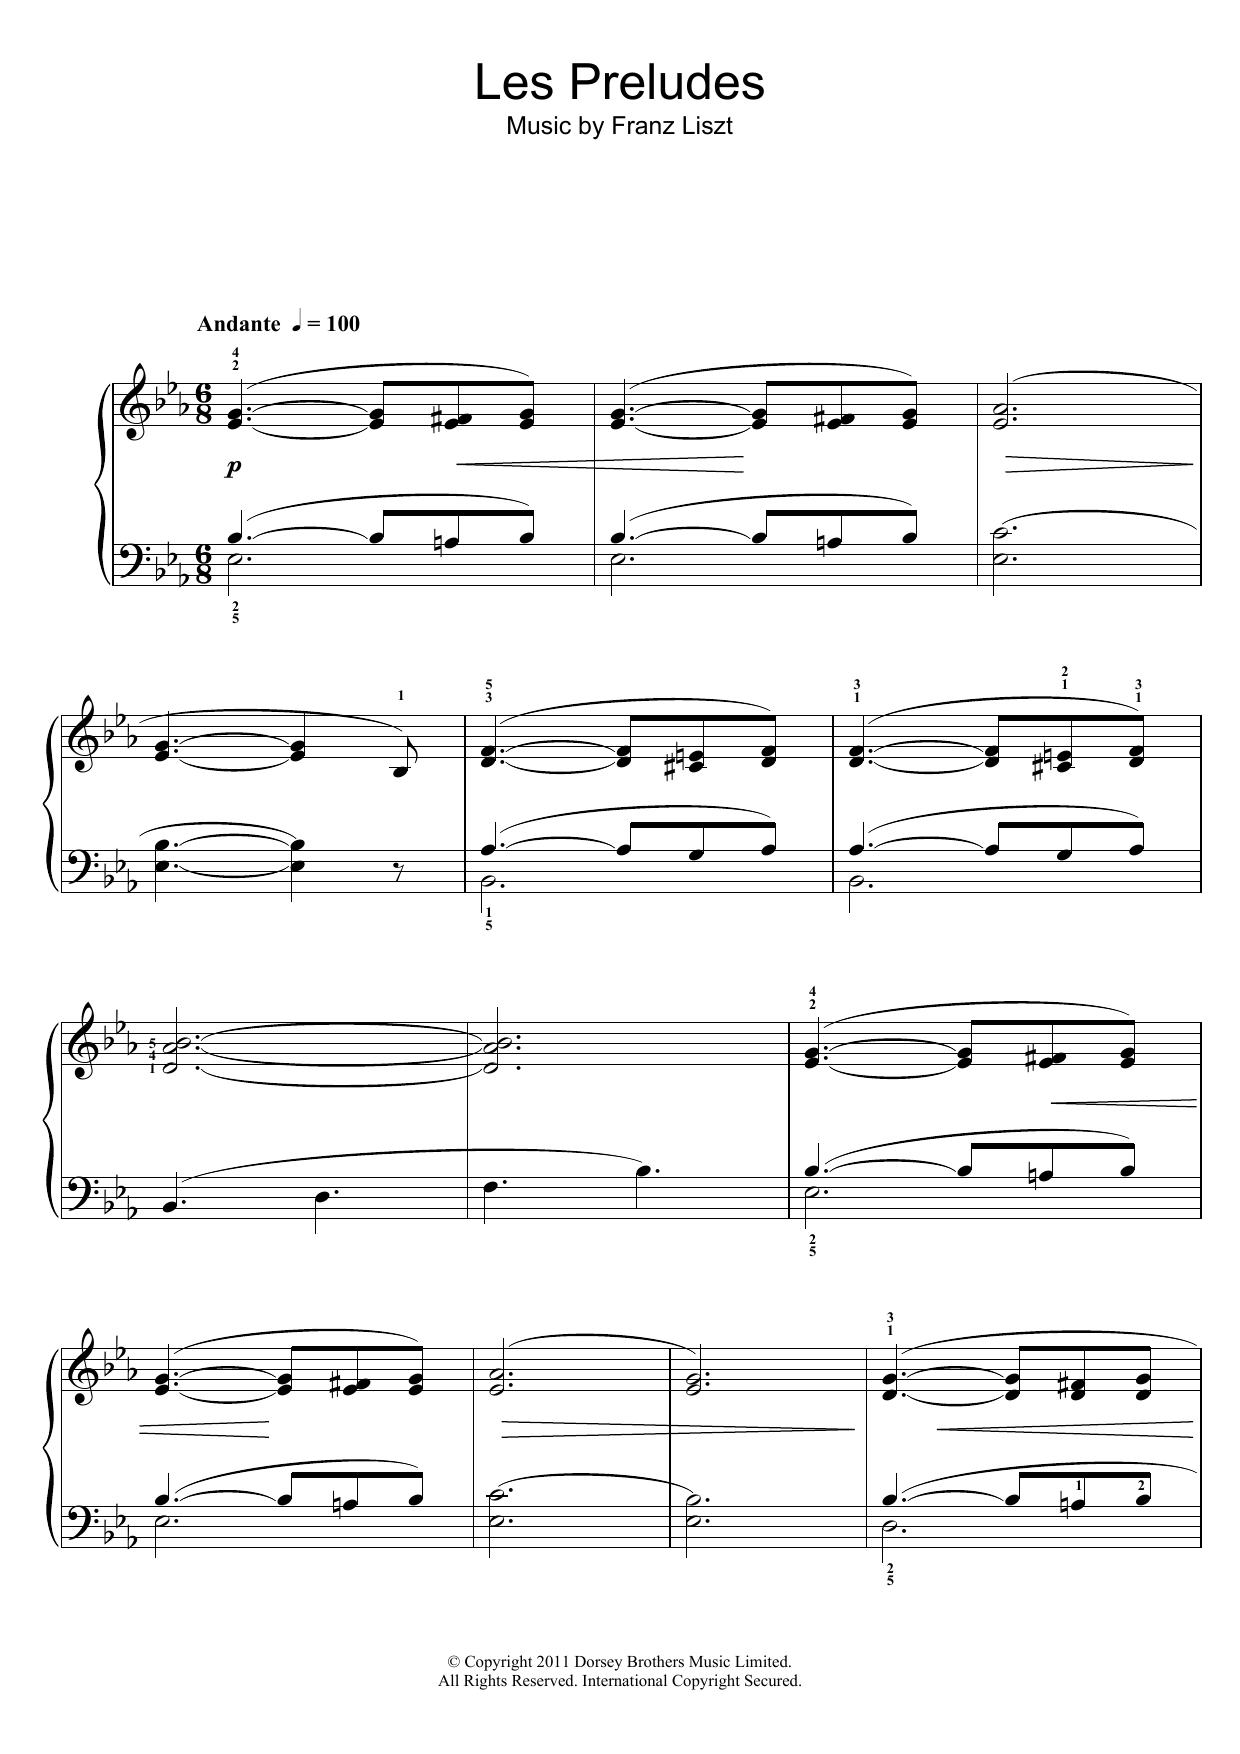 Franz Liszt - Les Preludes